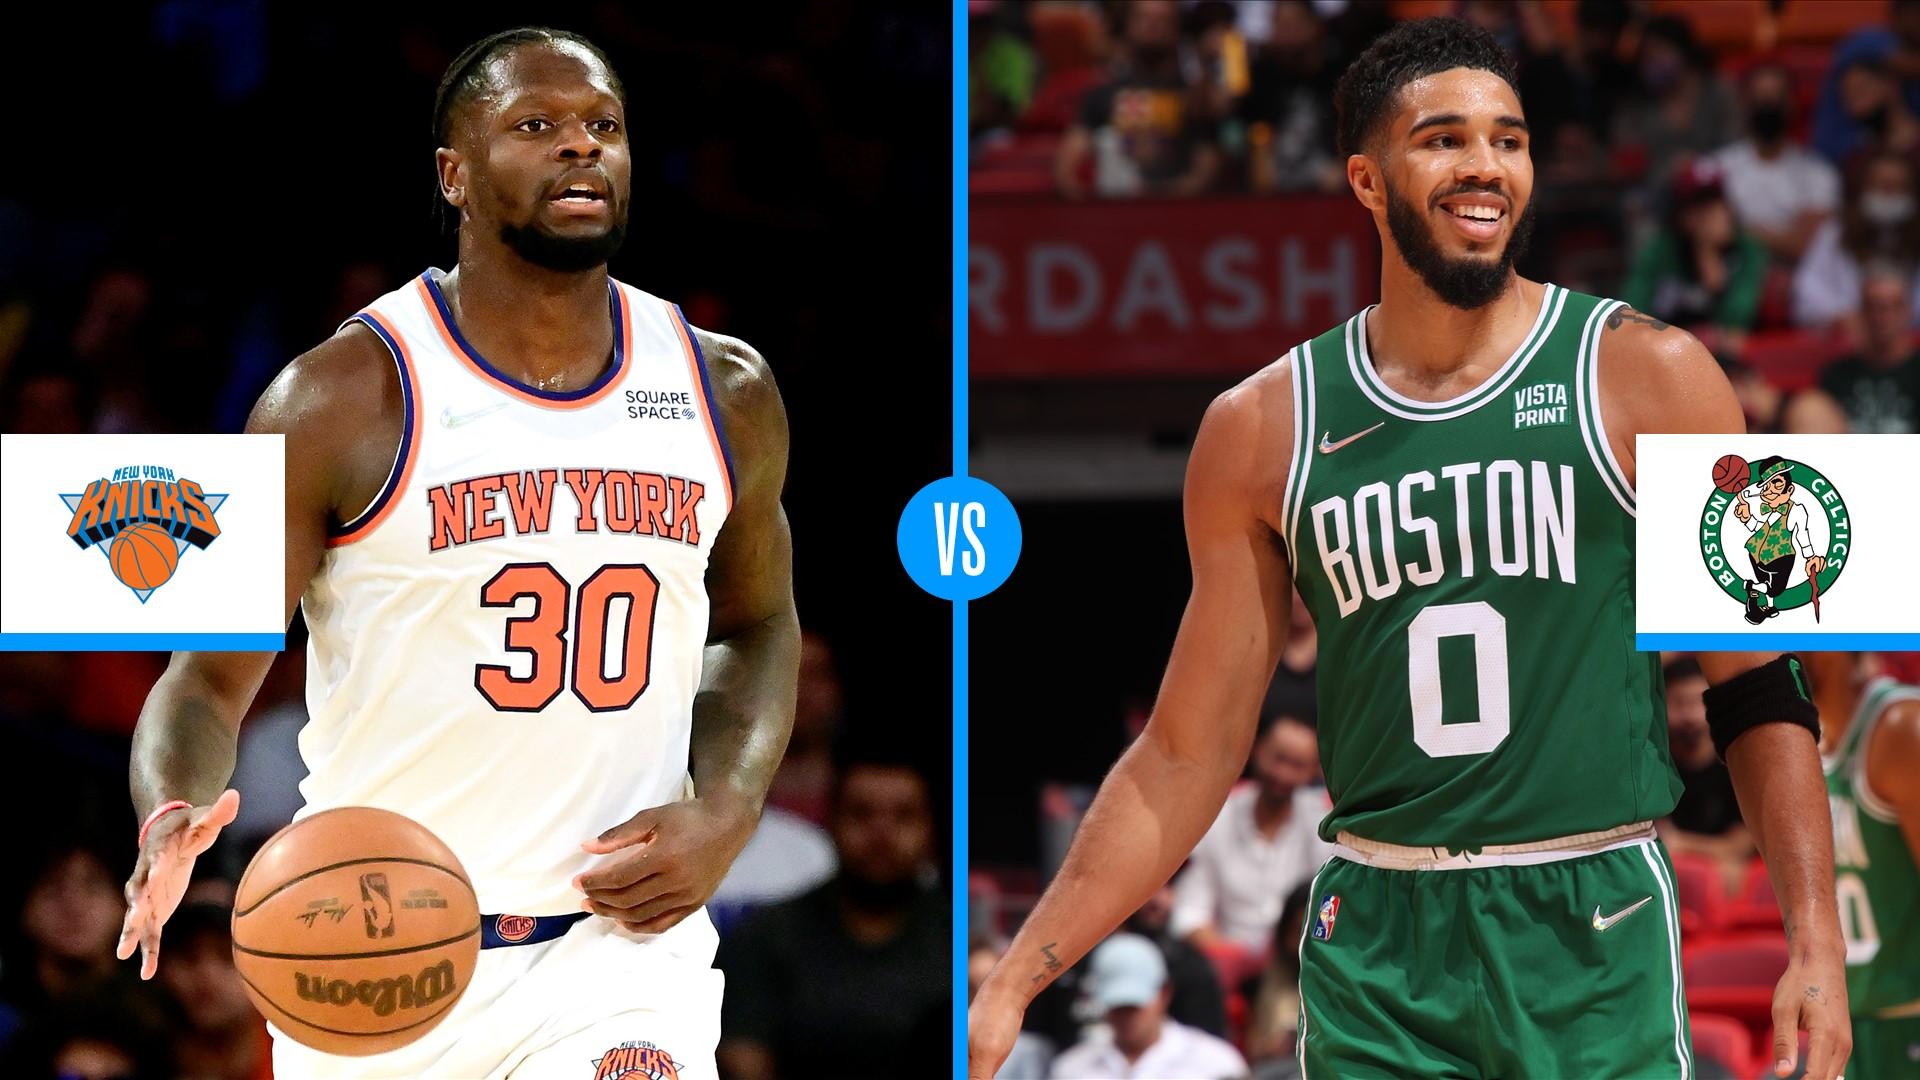 Knicks vs. Celtics live score, updates, highlights from 2021 season-opening NBA game